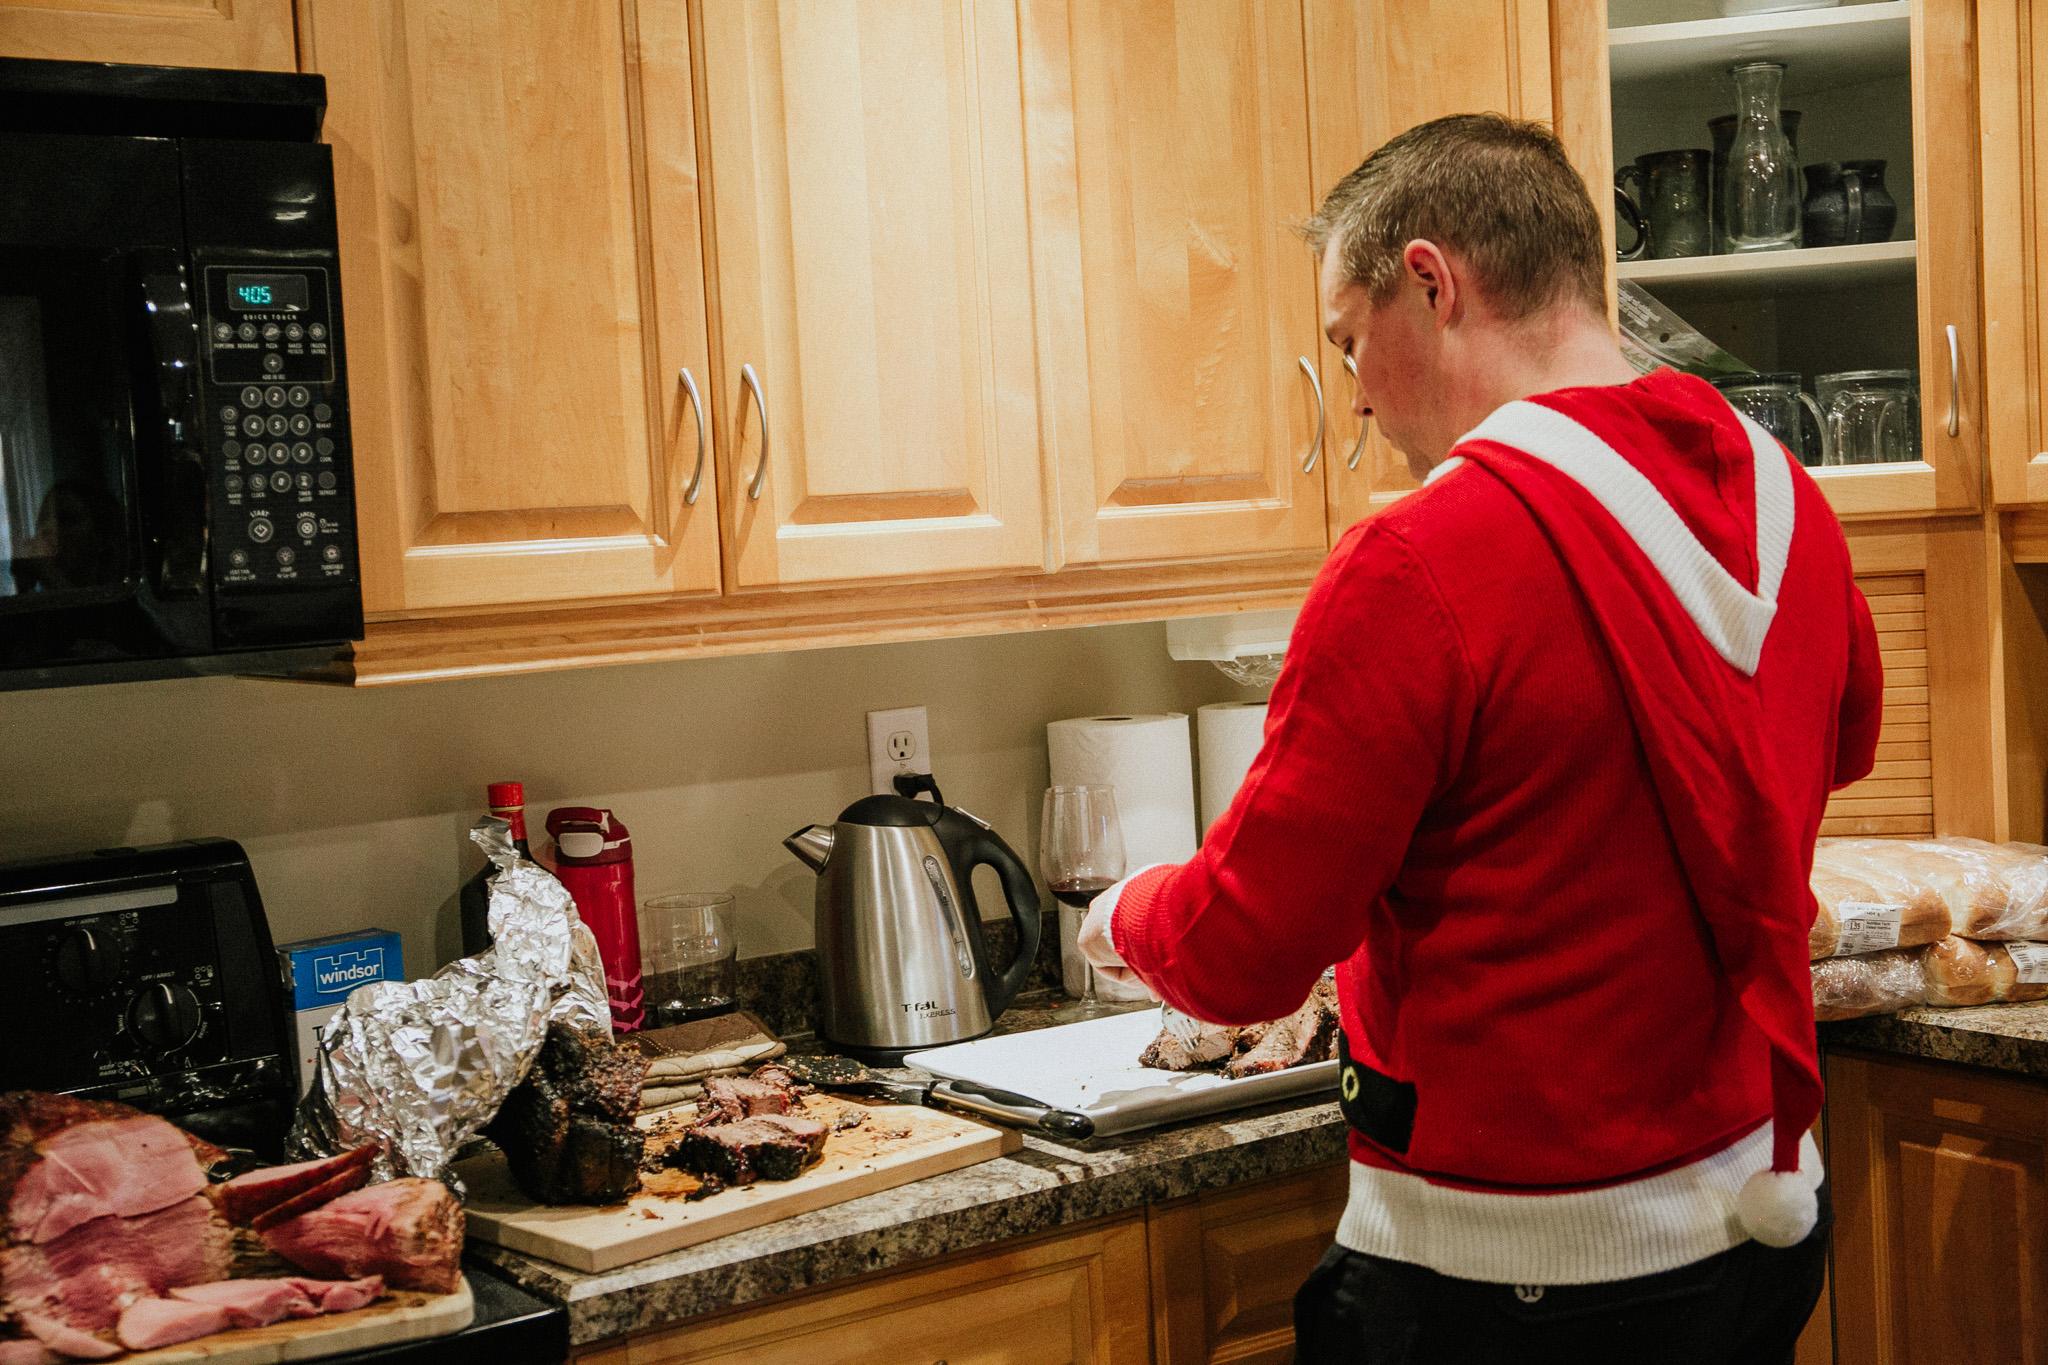 BIL -AKA-  BBQ Master - AKA - Brian   Preparing the feast